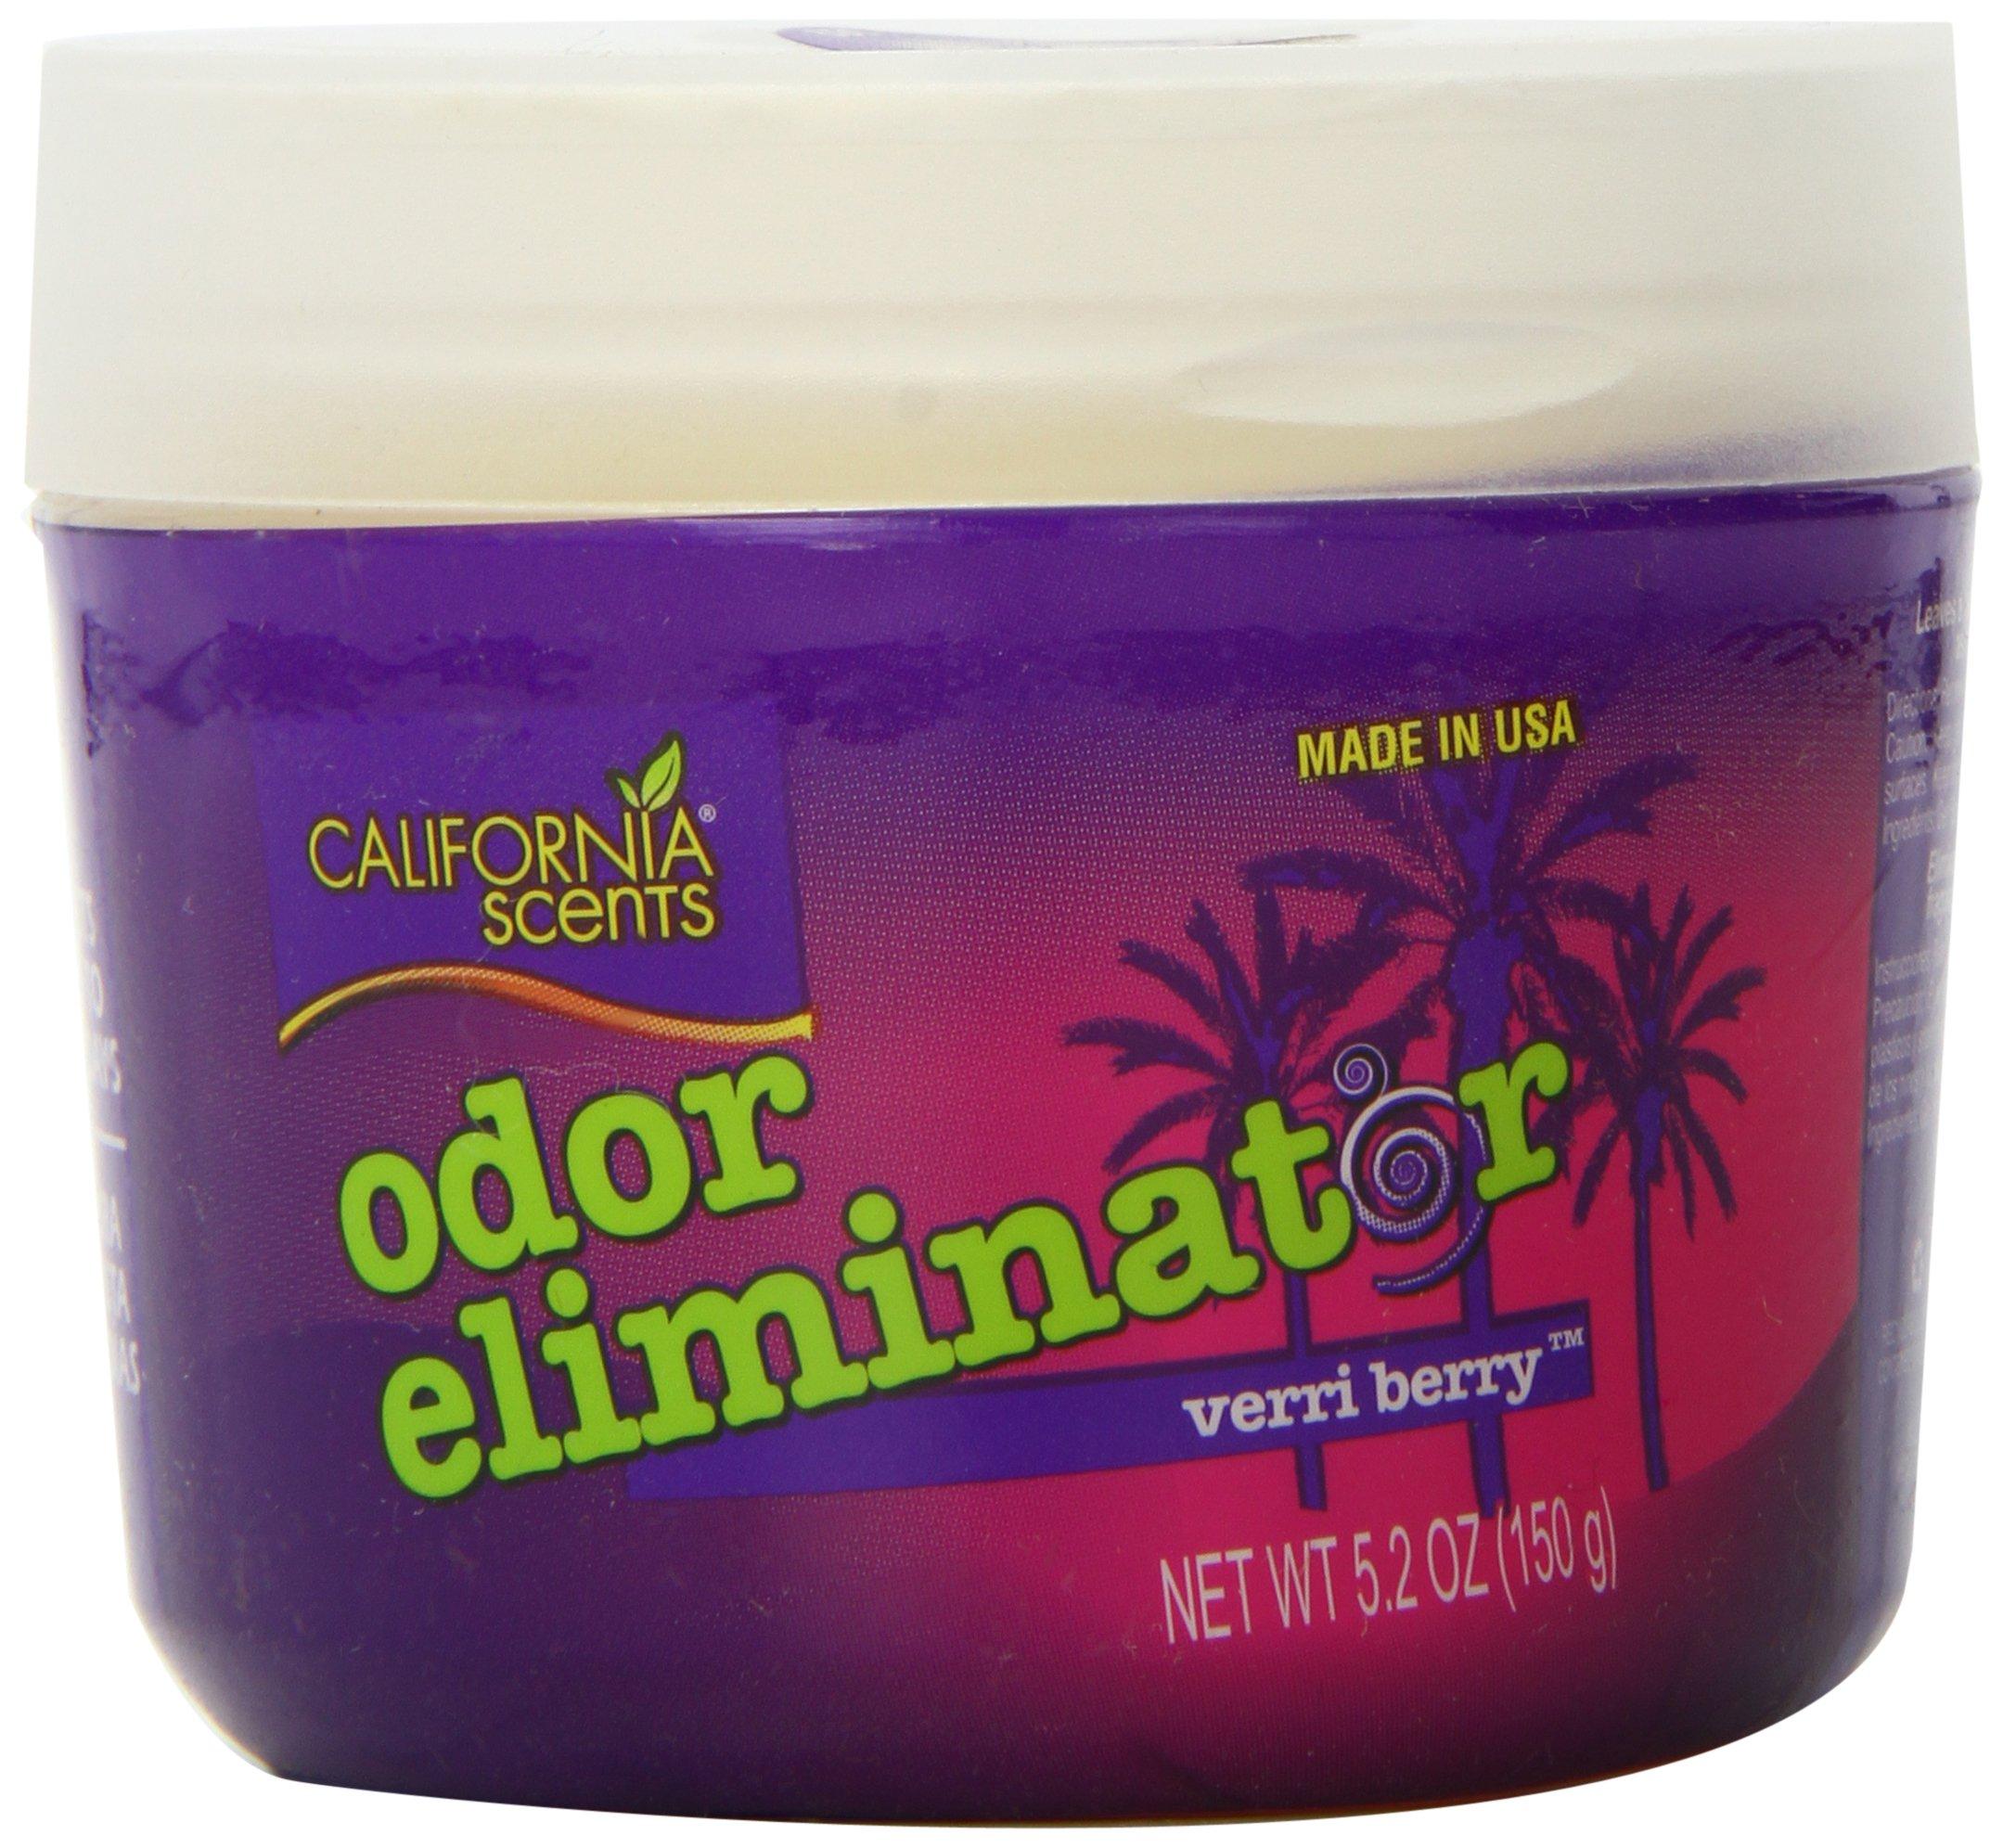 California Scents Odor Eliminator, Verri Berry, 5.2-Ounce Jars (Pack of 12)